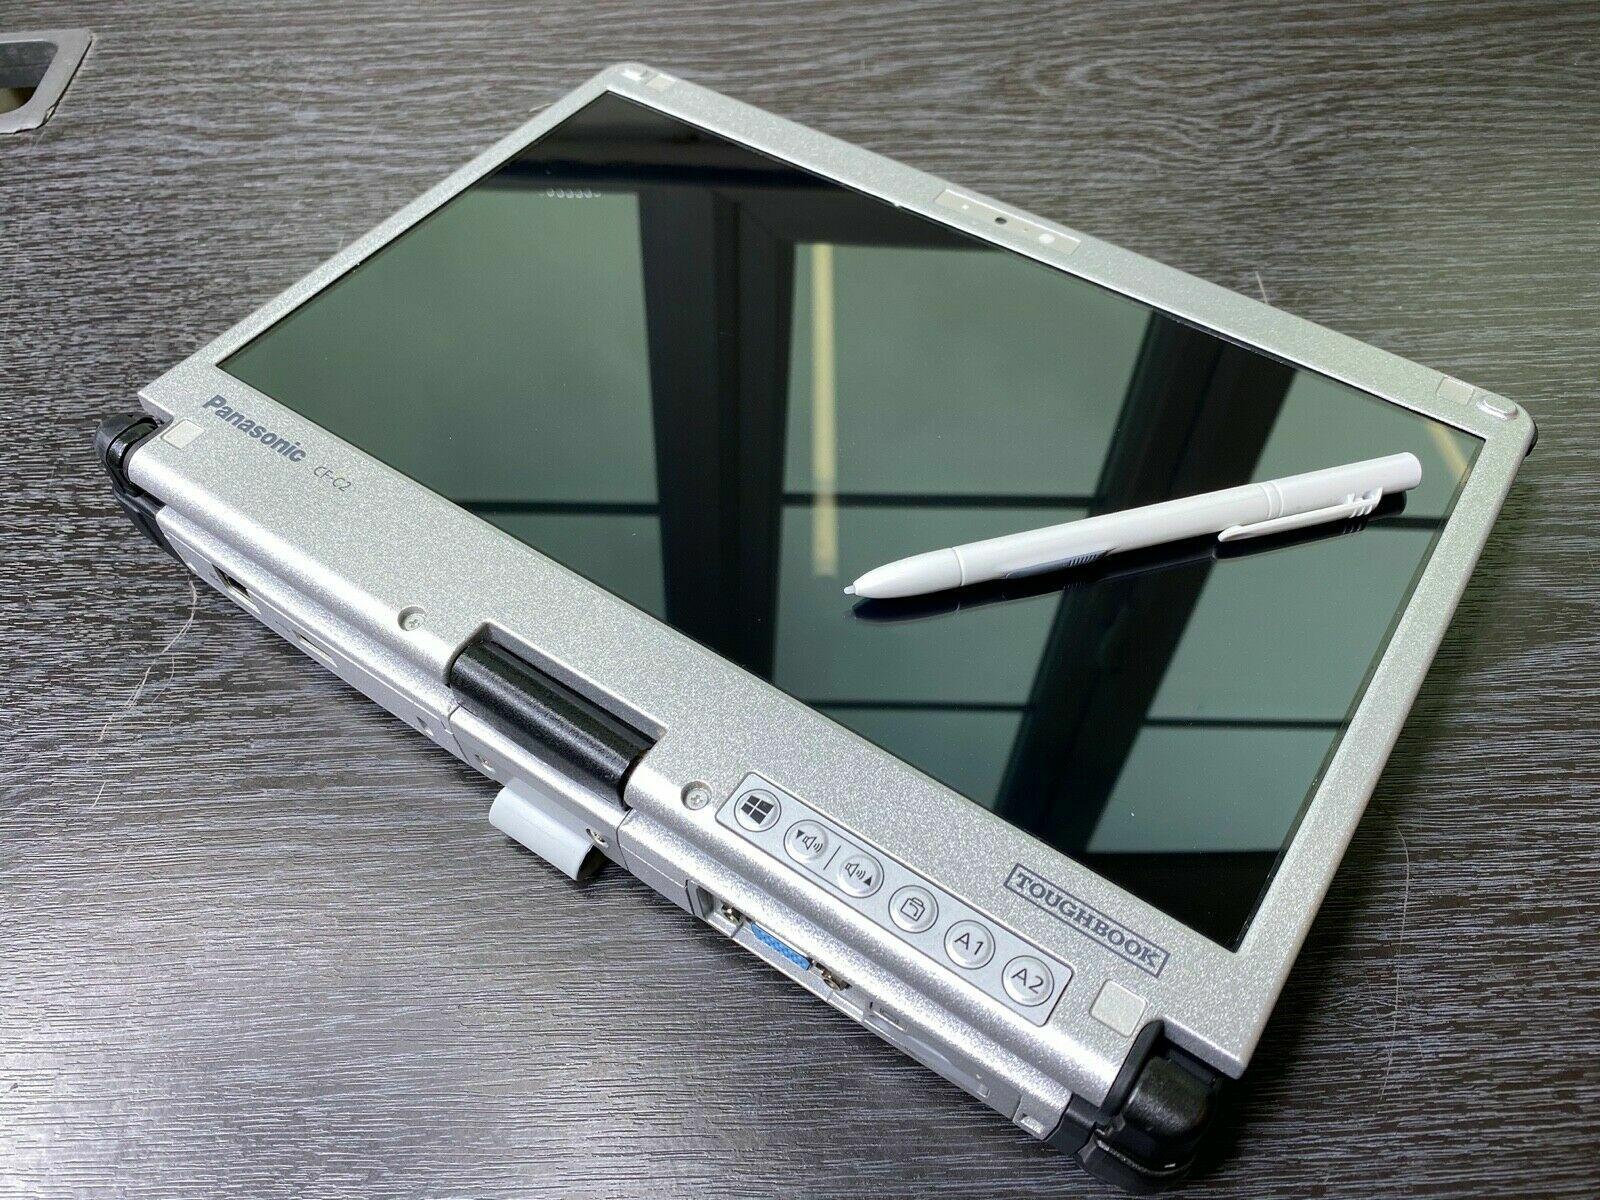 Laptop Windows - Panasonic Toughbook CF-C2 Rugged Laptop,Touch i5 4th Gen,8GB,256GB SSD,W7/W10 GC